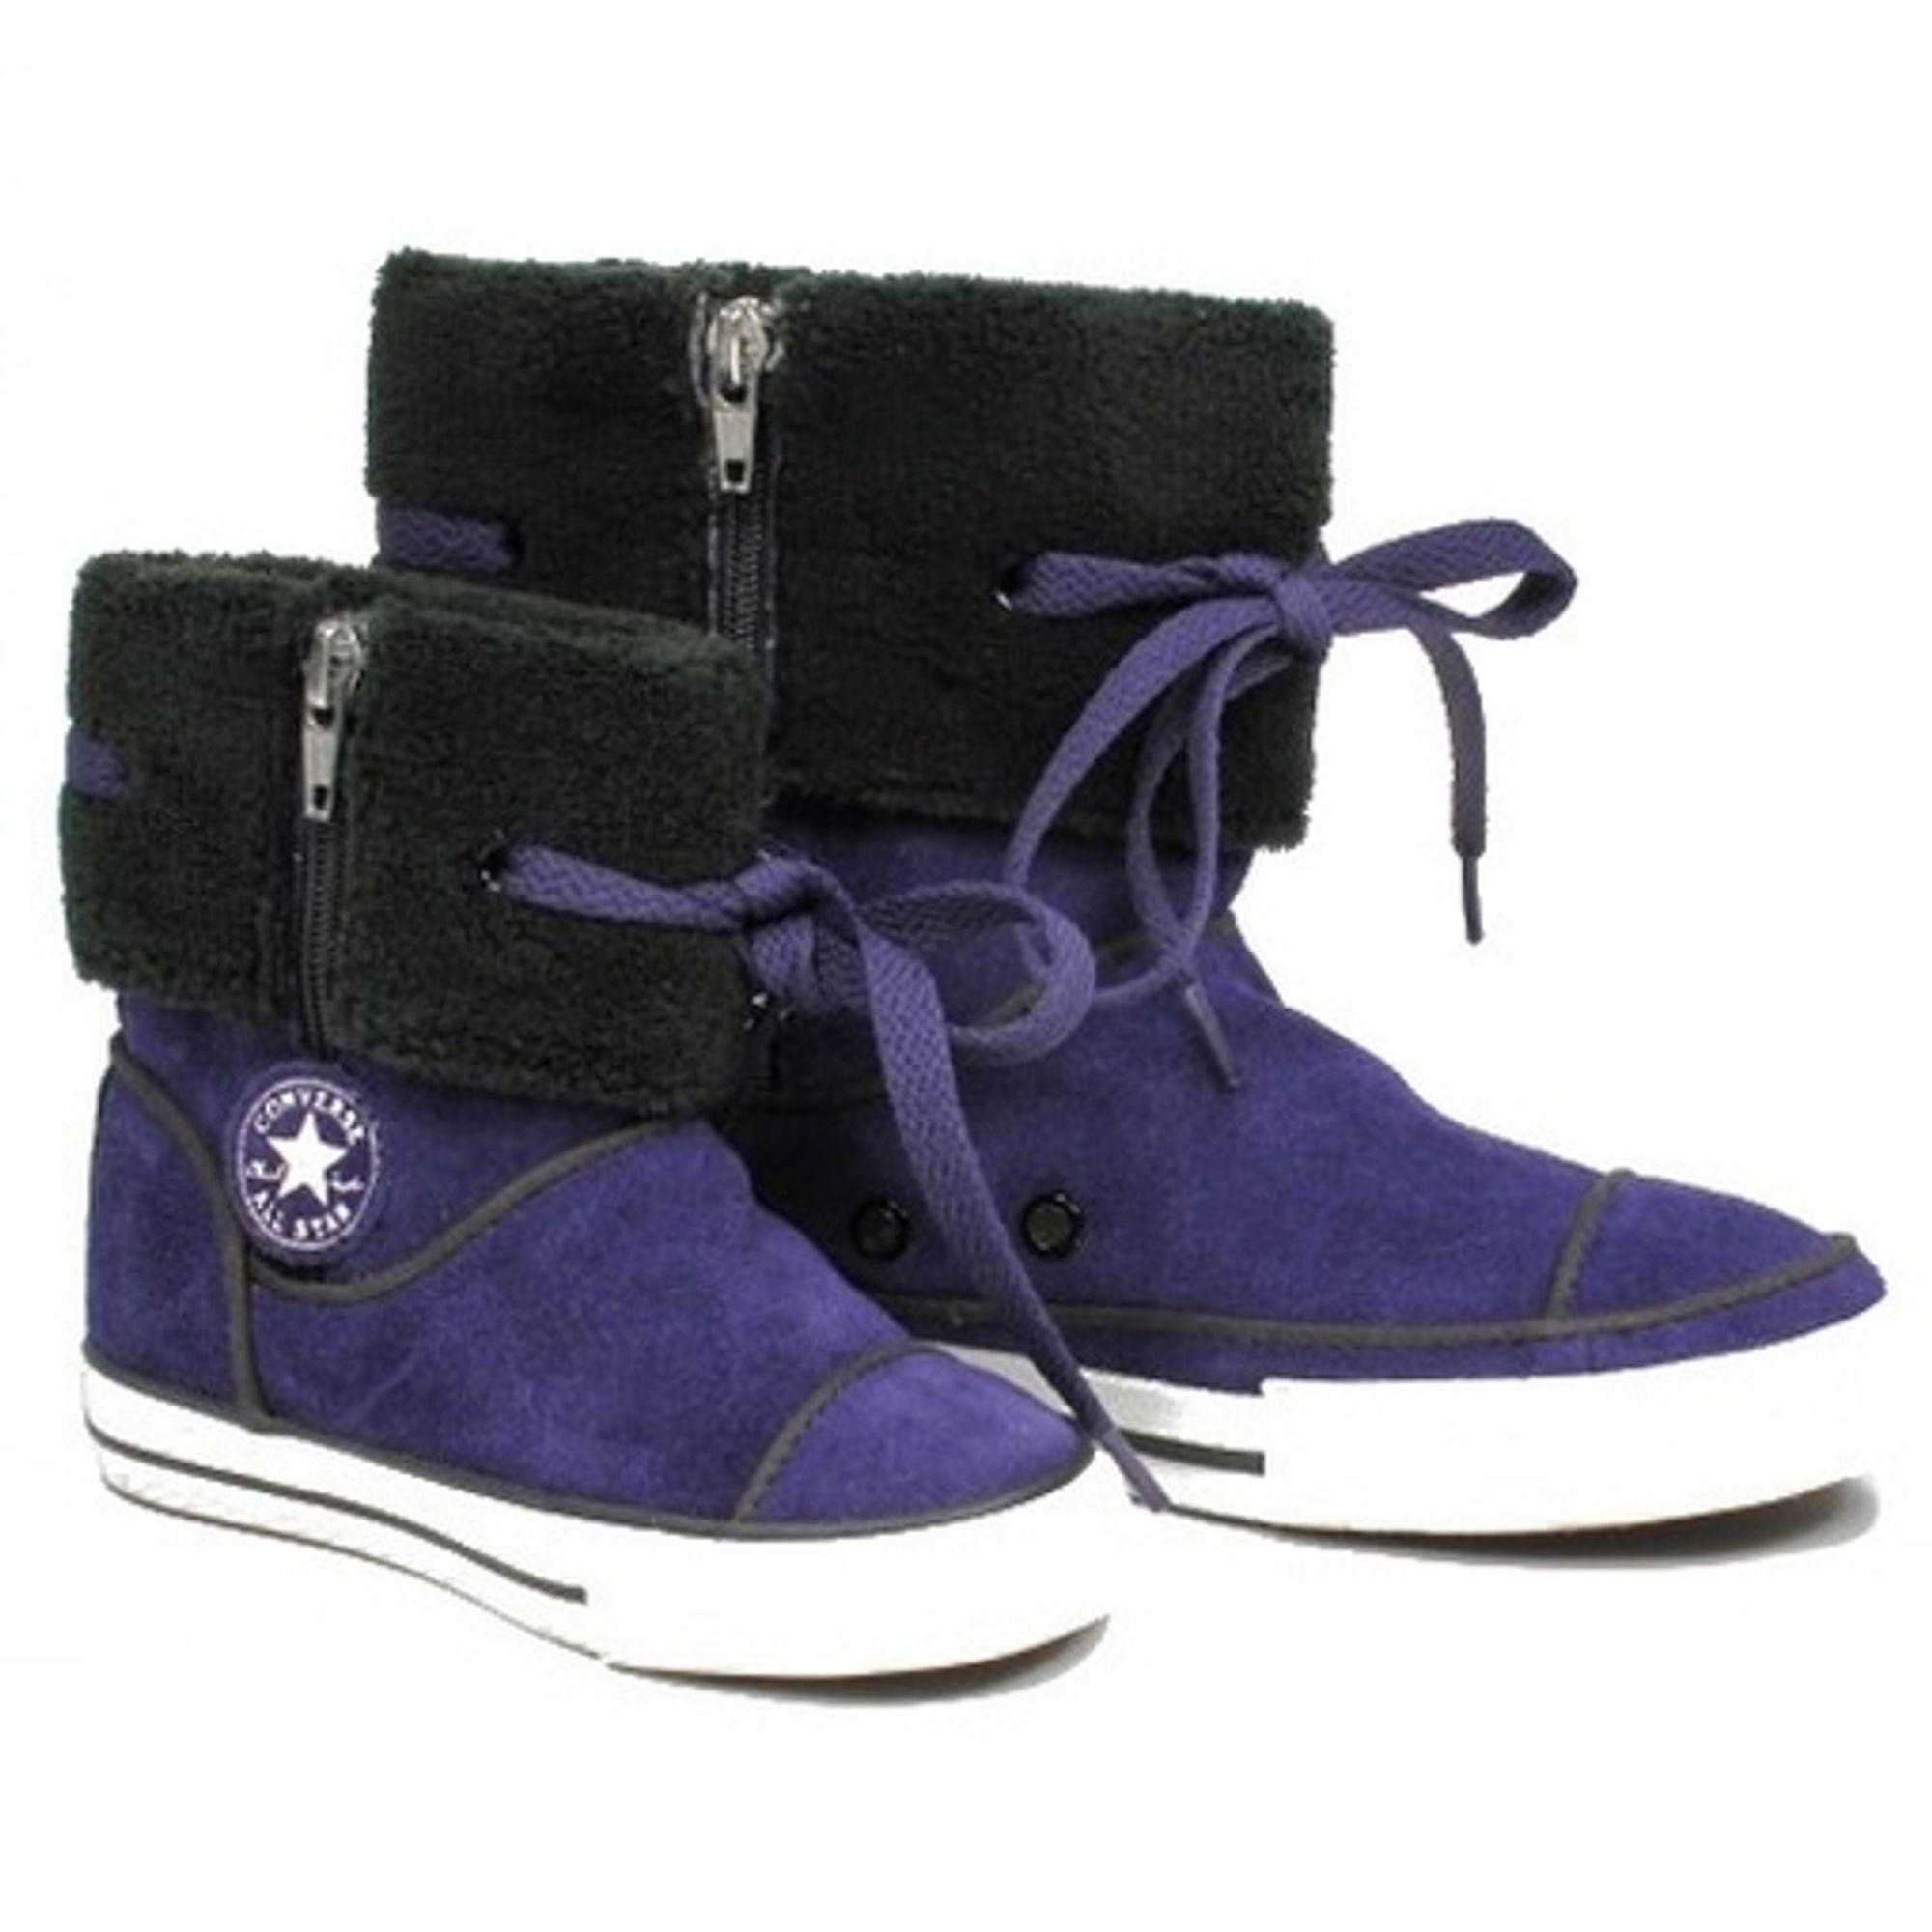 Converse Kinder Schuhe CT ANDOVER 617671 Lila Stiefel Lila Größe 33 lilat-Dunkelgrau-Weiß-Schwarz